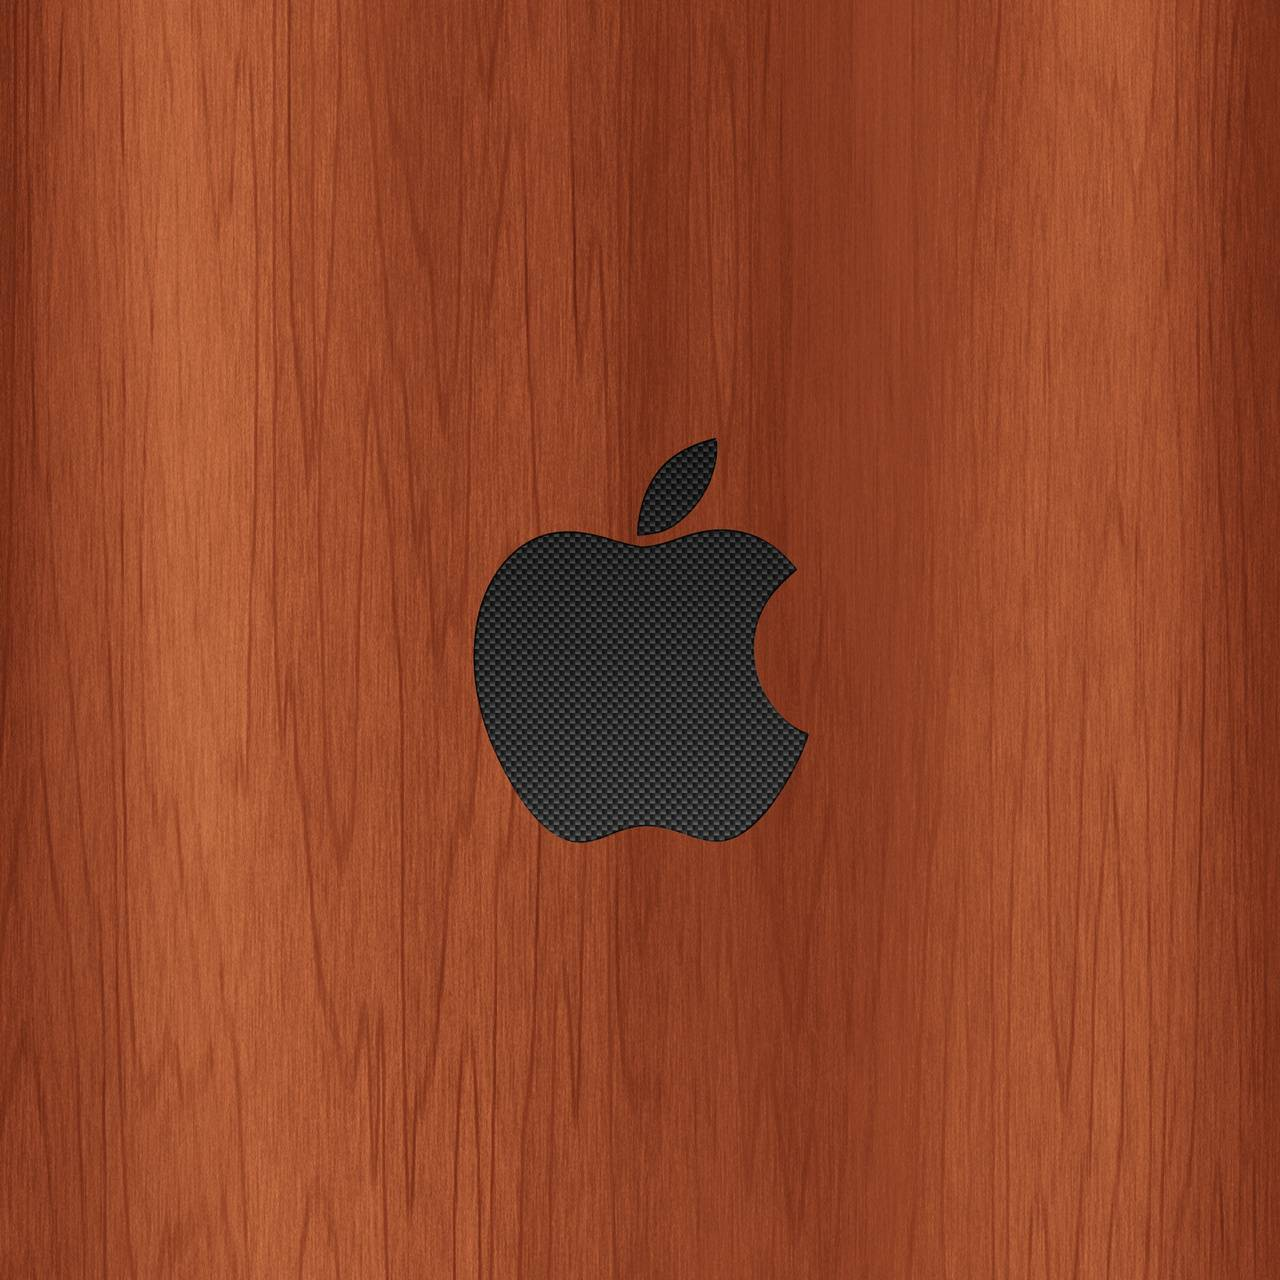 Apple Carbon Fiber